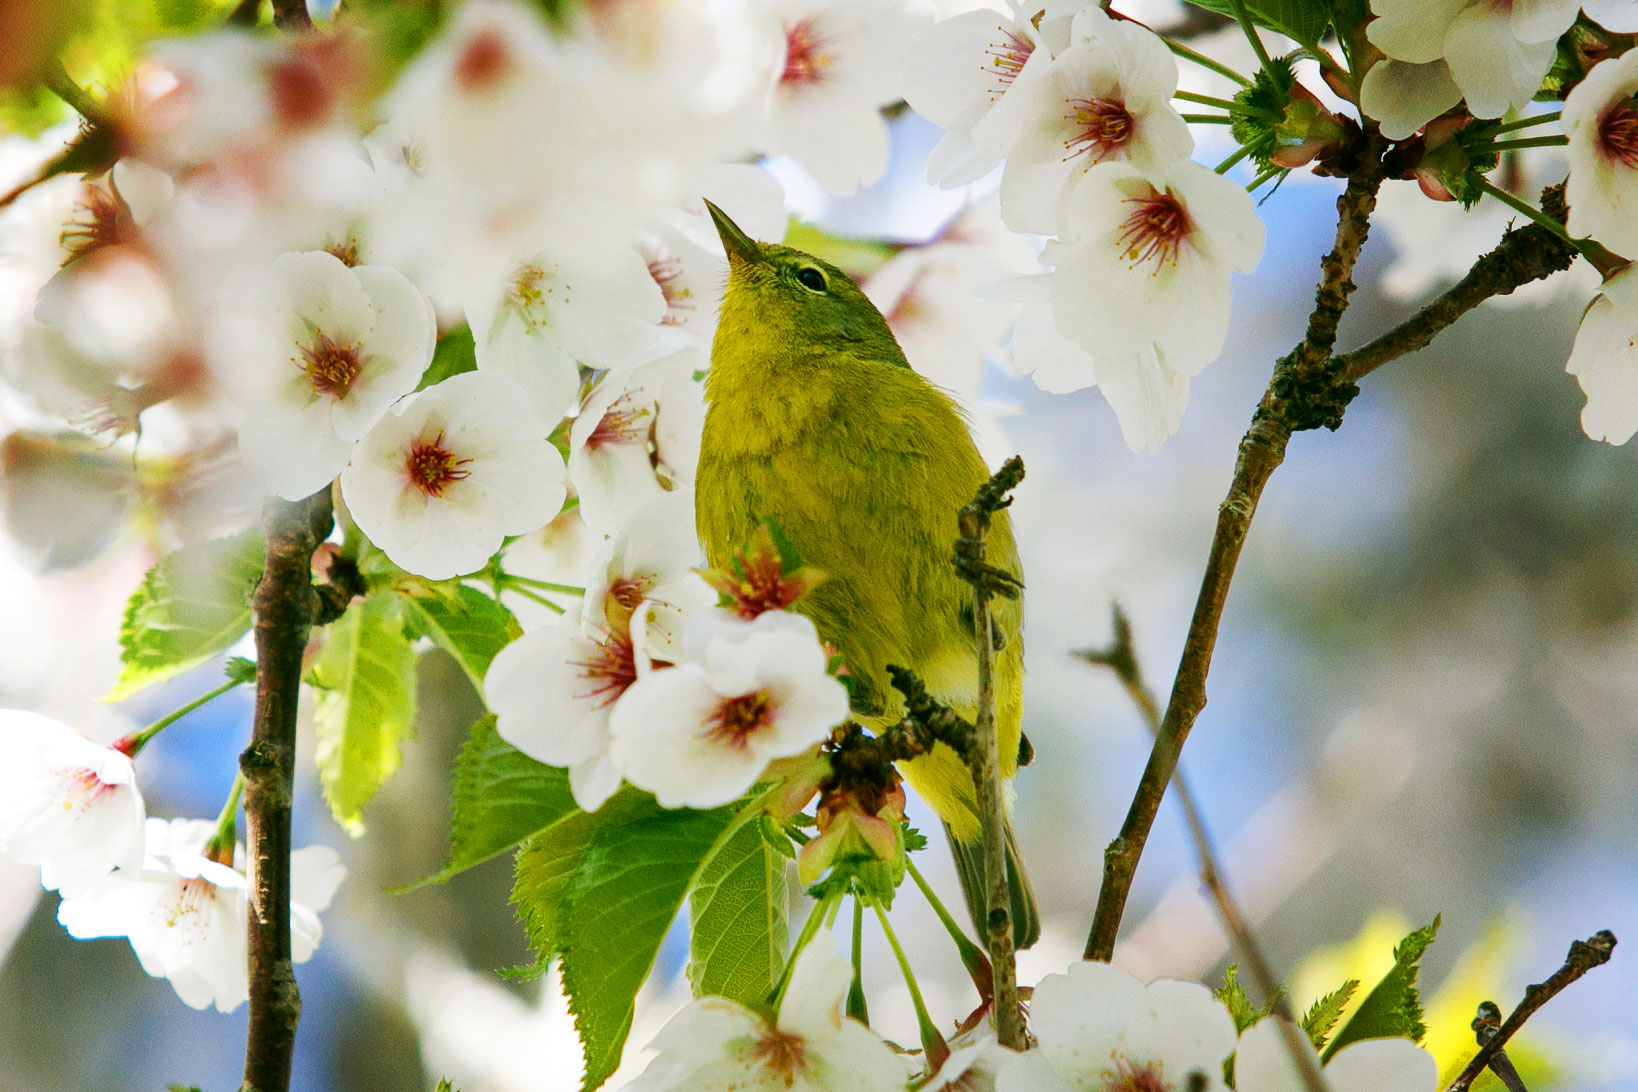 Bright green Warbler bird sitting in cherry blossoms.